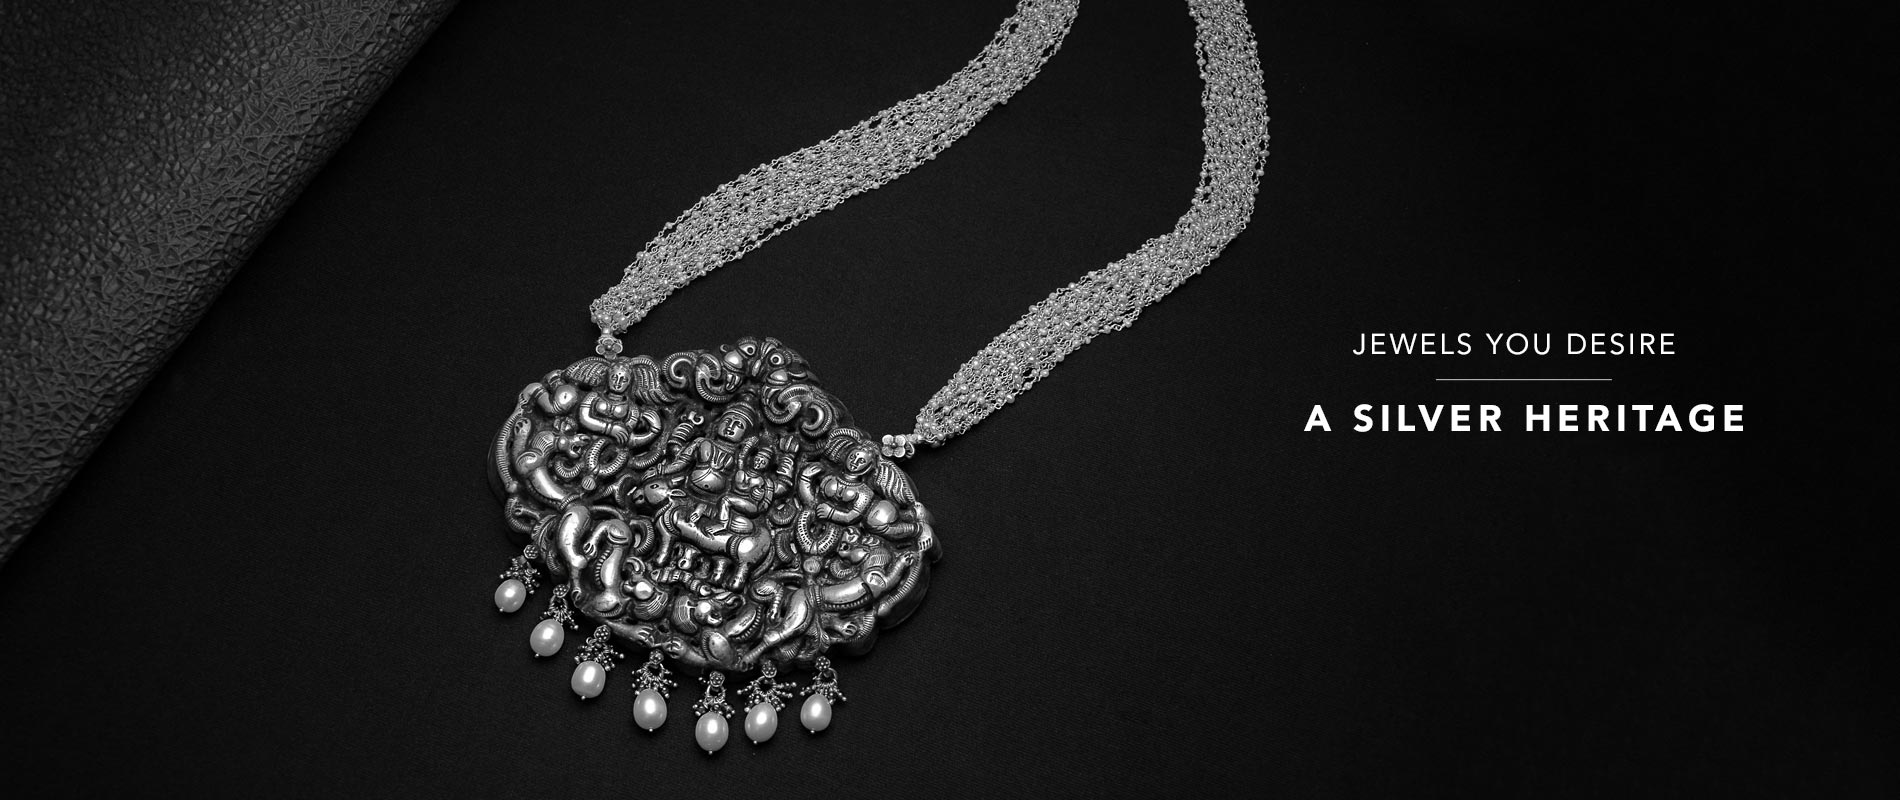 170411NHJ036_Naresh_Handicrafts_6248